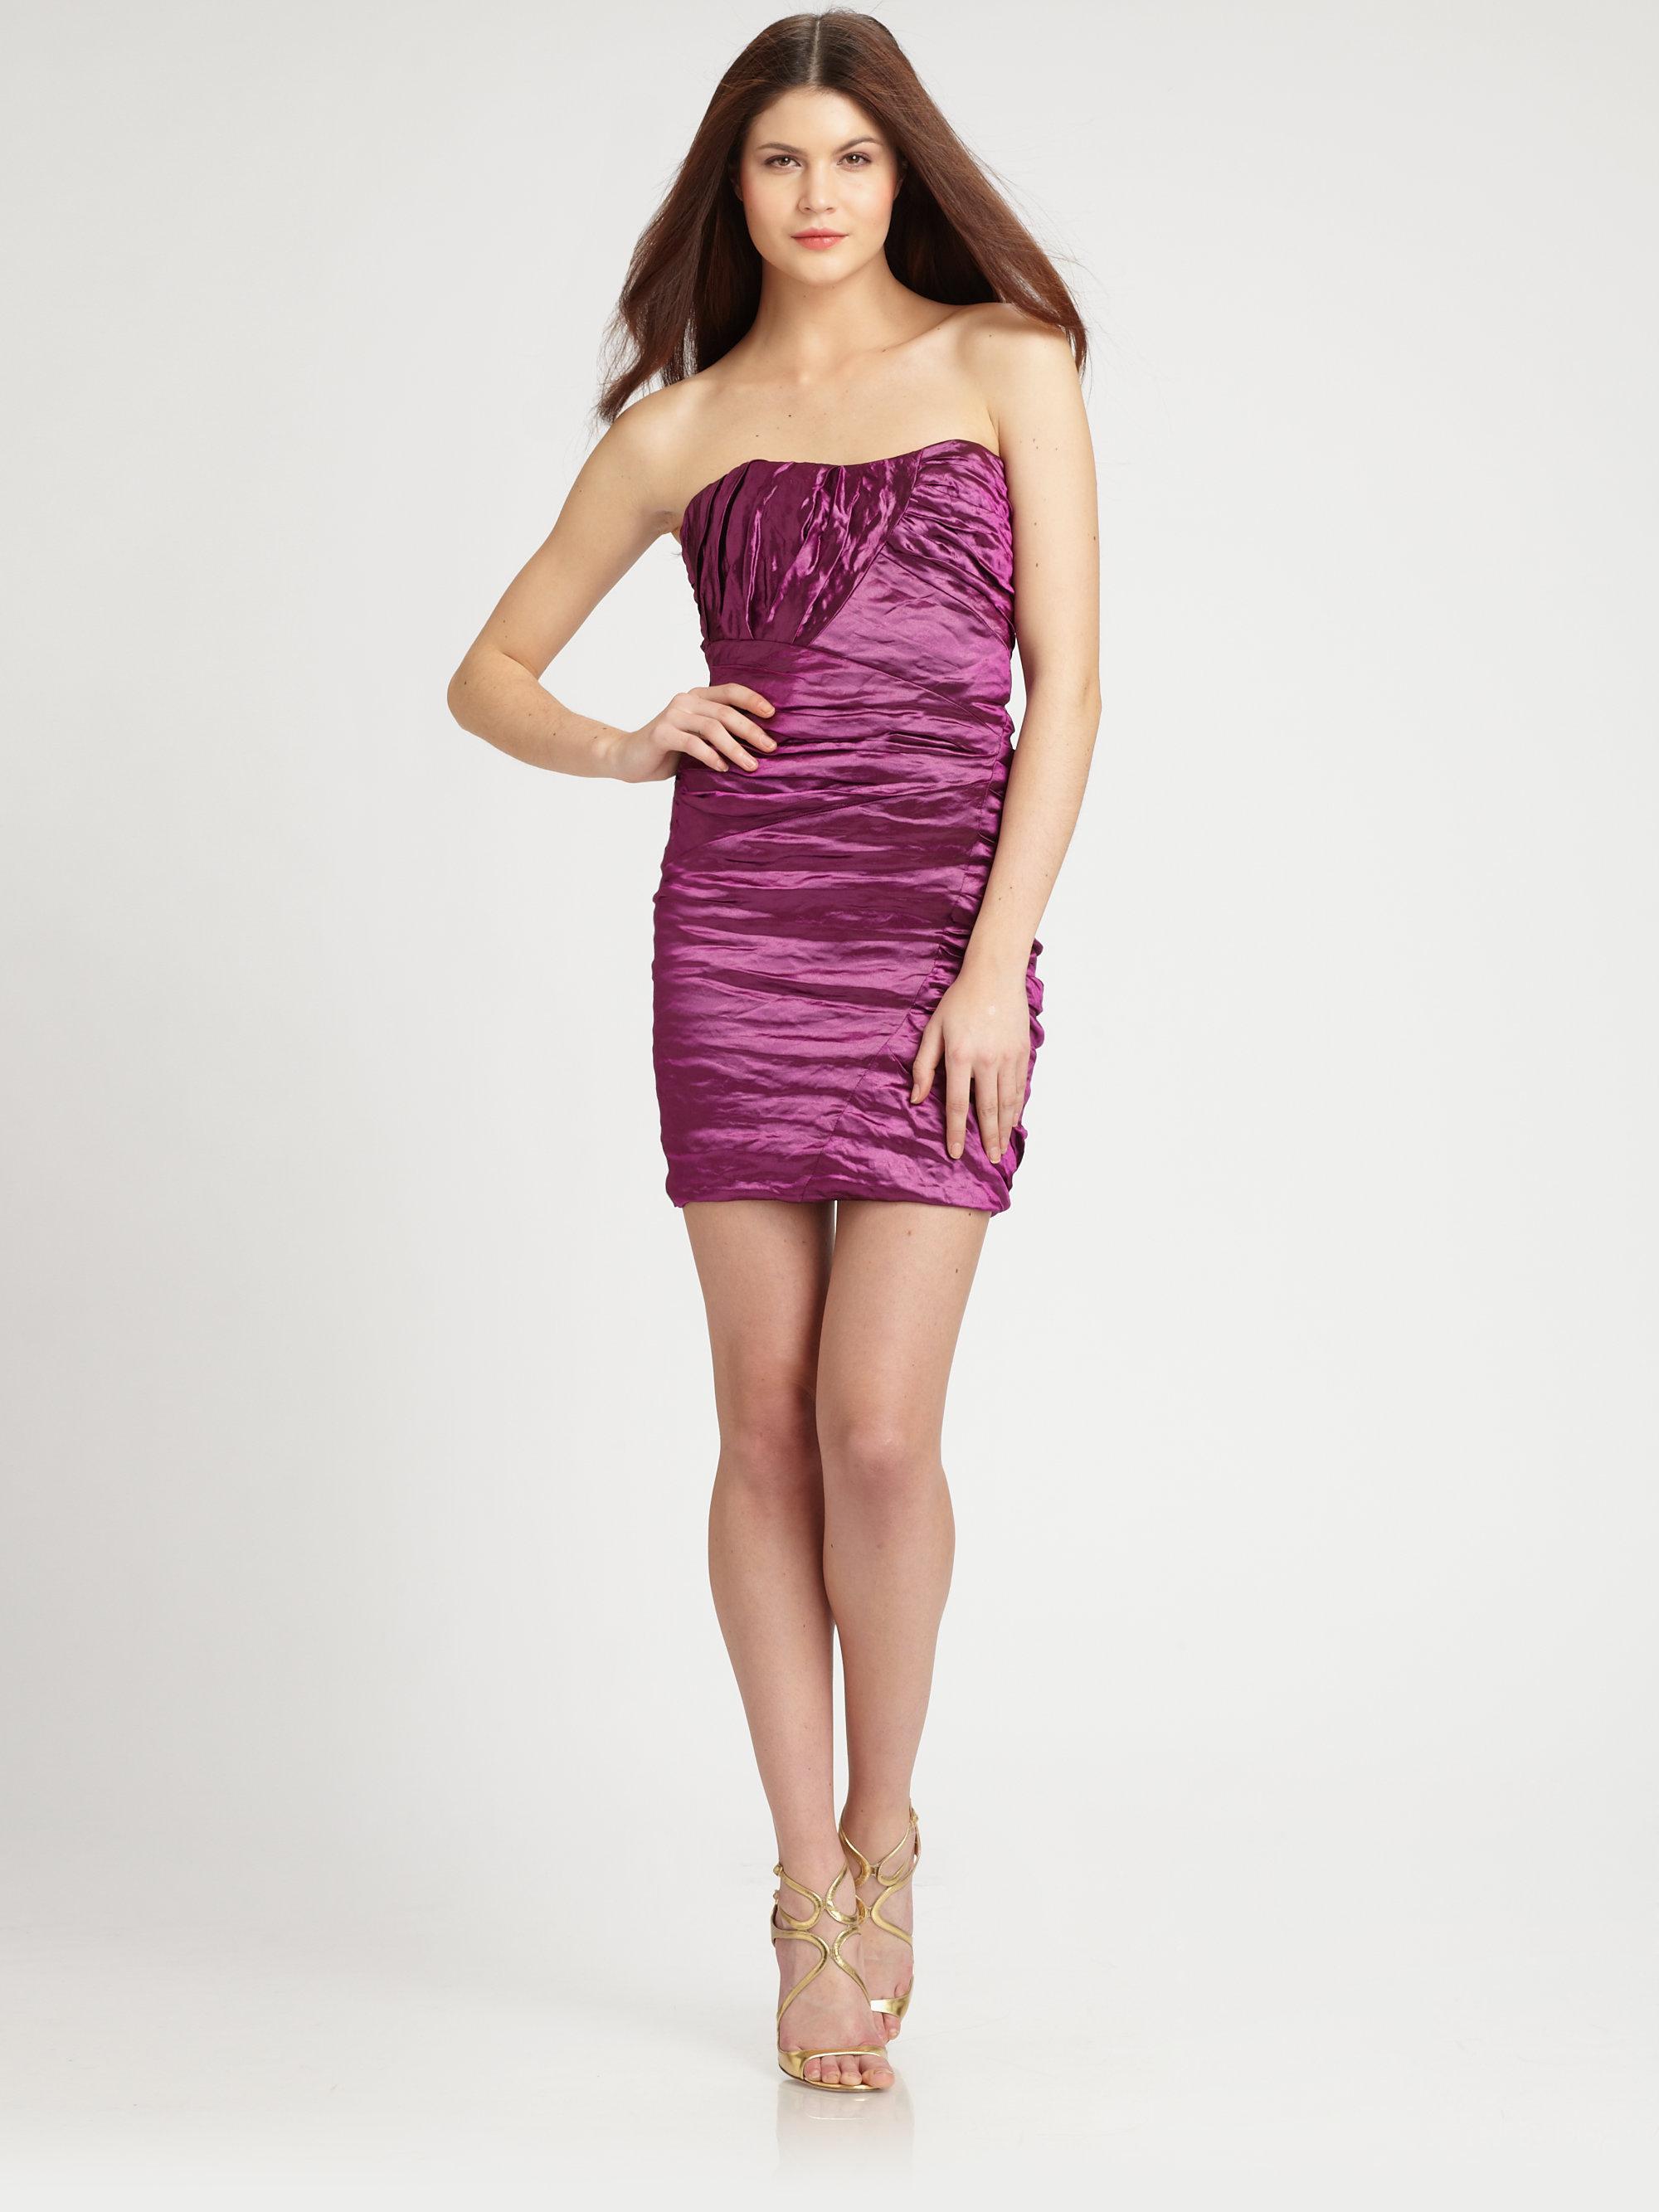 Nicole Miller Strapless Mini Dress in Purple (magenta)